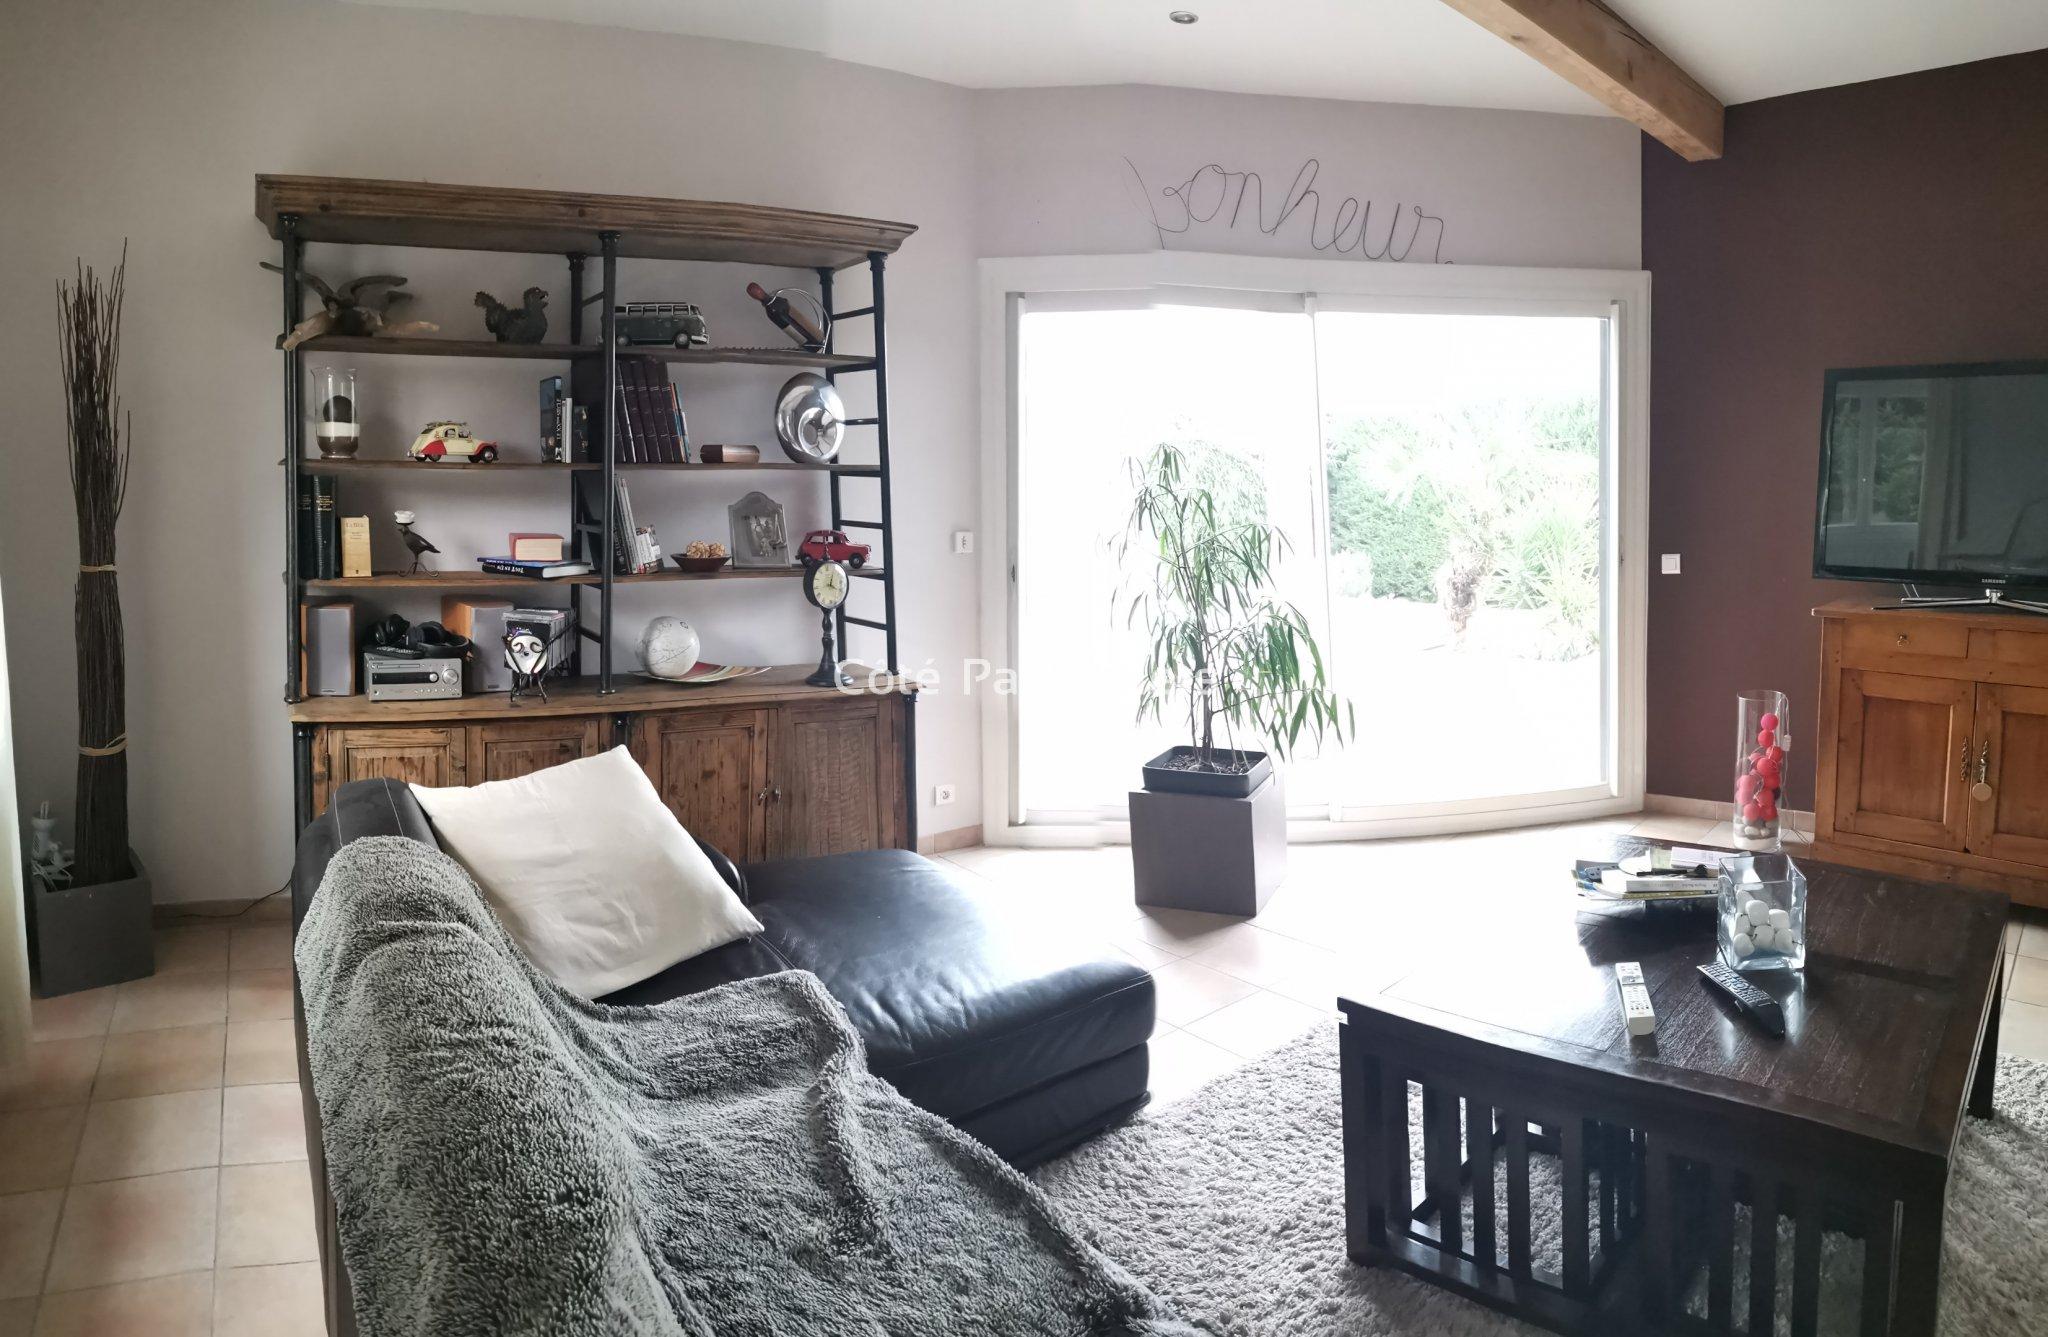 Vente Maison 160 M² - Grazailles - Piscine avec Piscine Grazailles